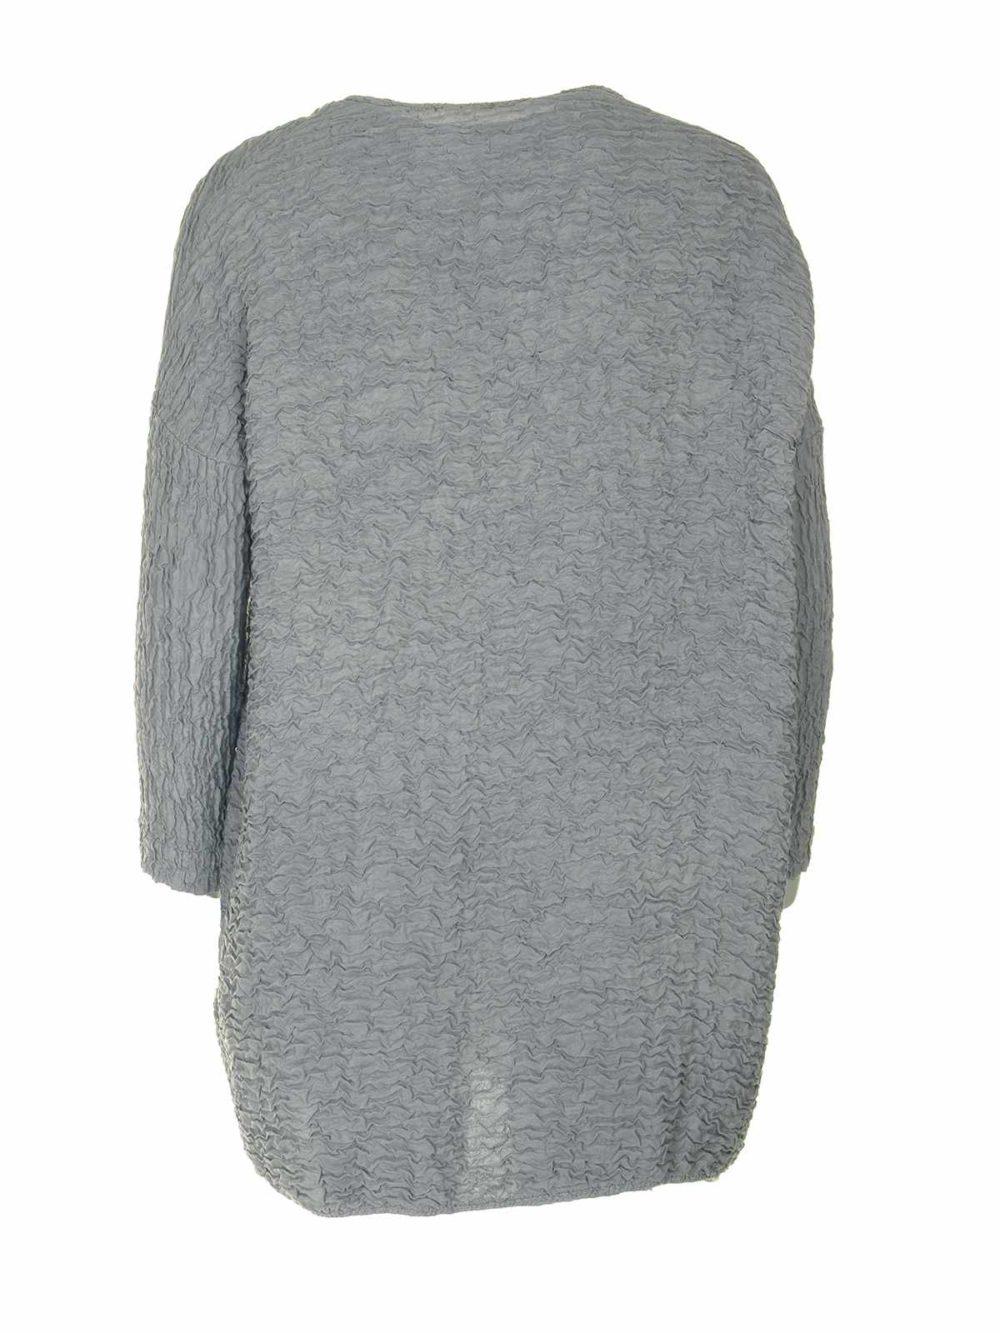 Blouse 51889-S40 Grizas Katie Kerr Women's Clothing